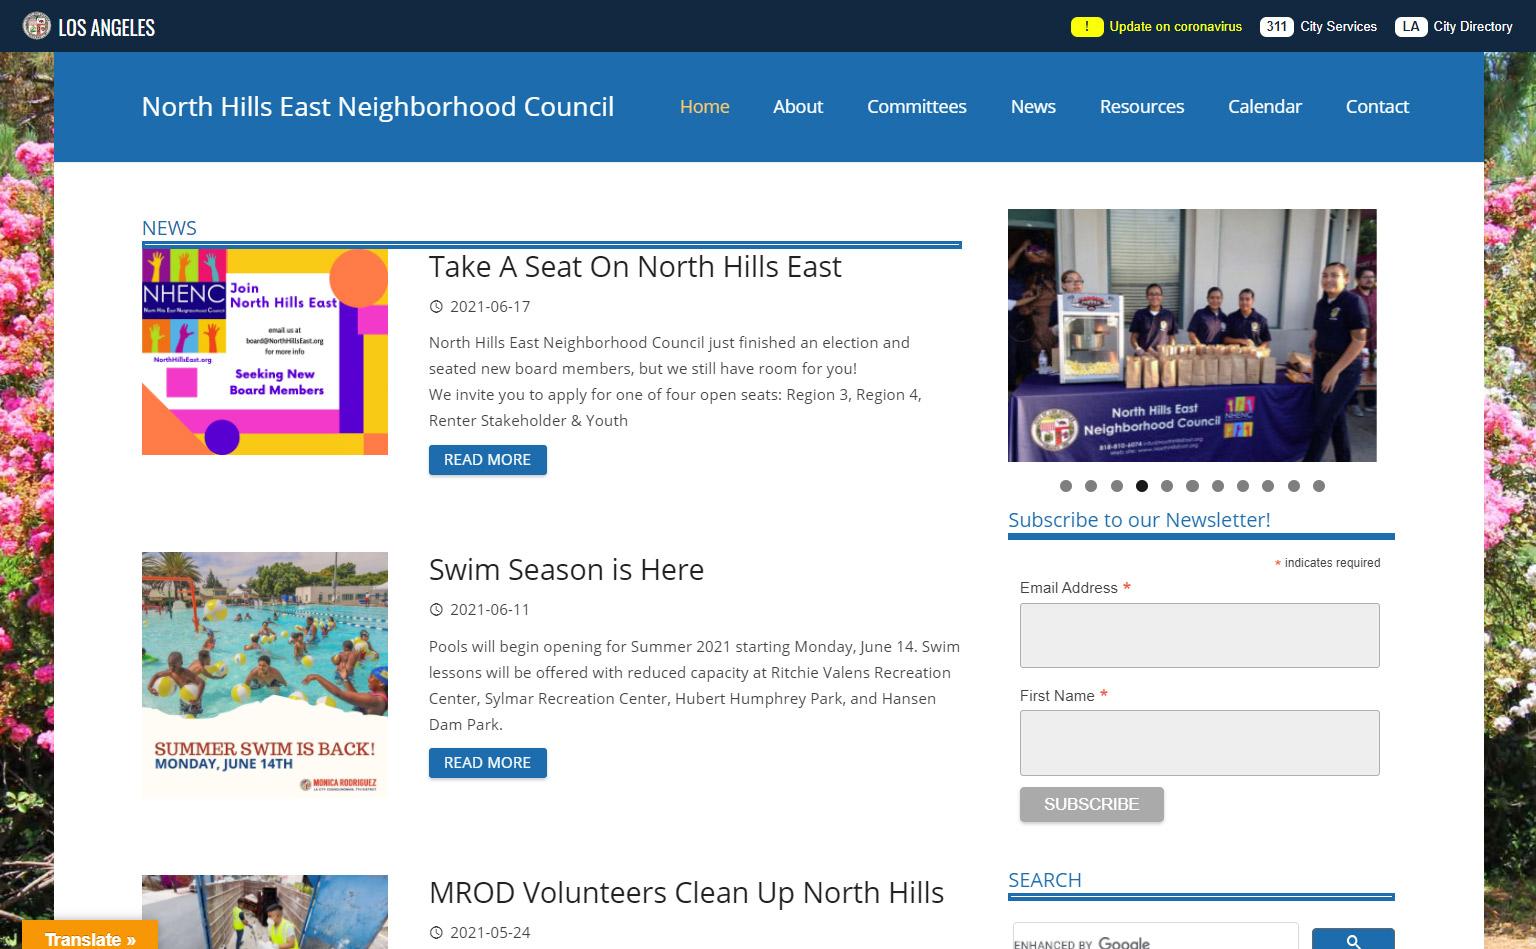 North Hills East Neighborhood Council